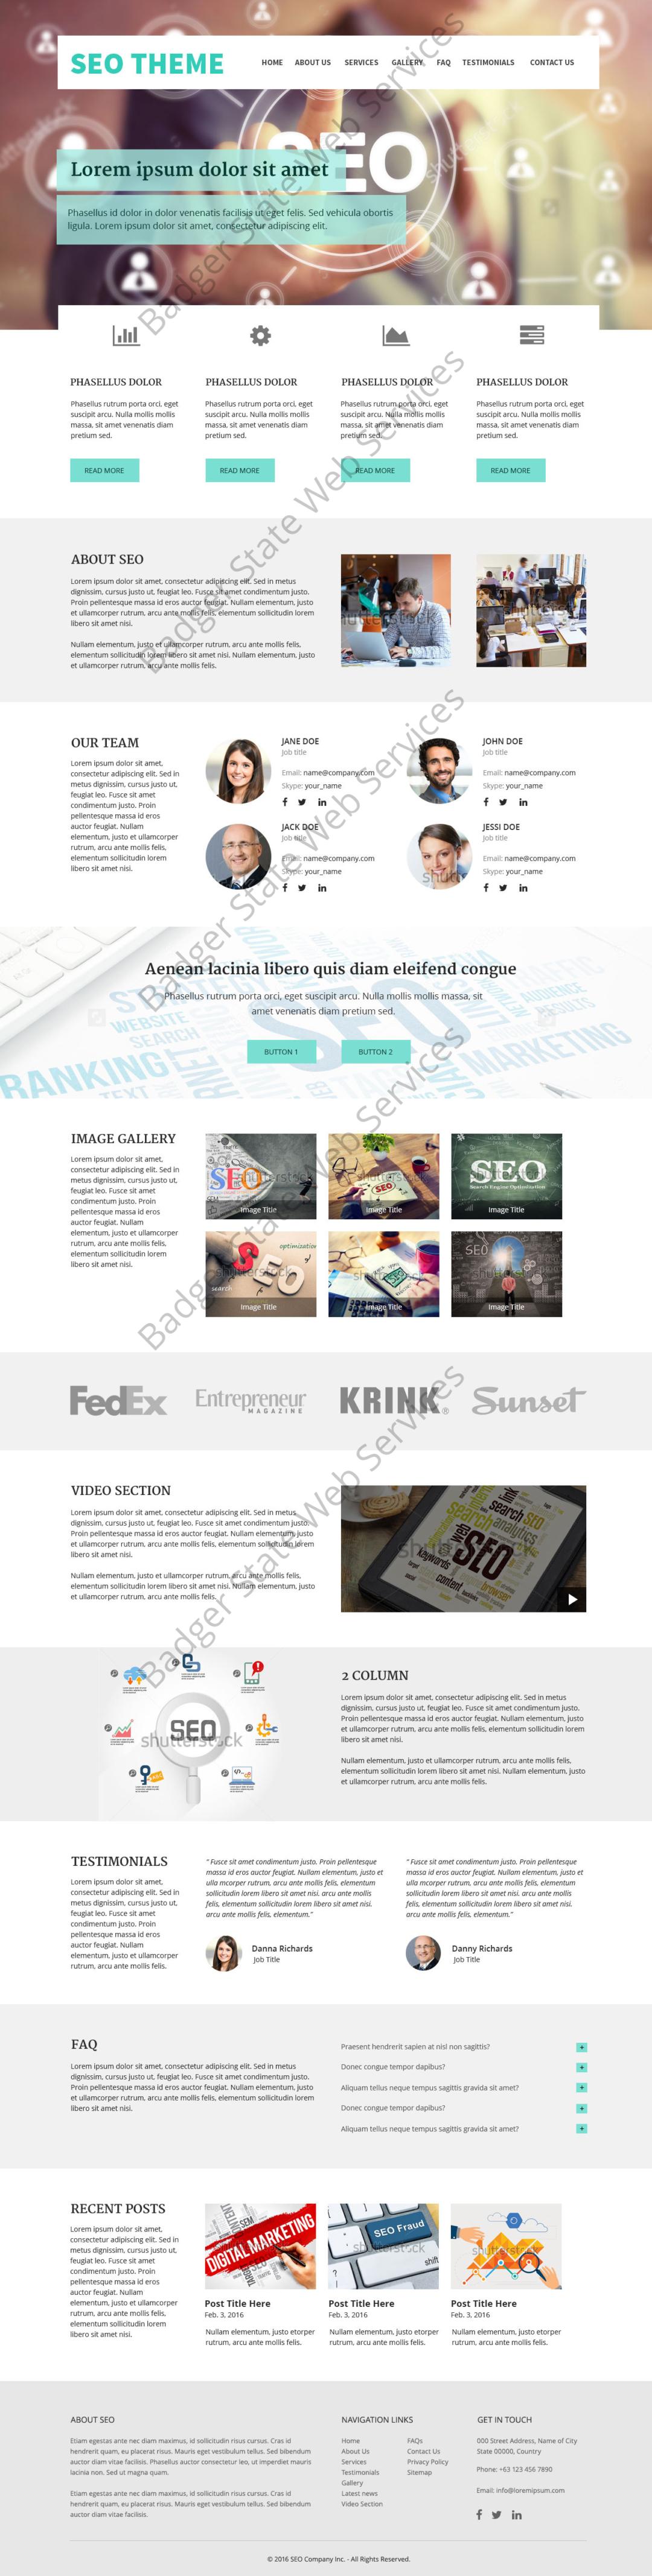 seo web design mockup v web design seo agency marshfield wi